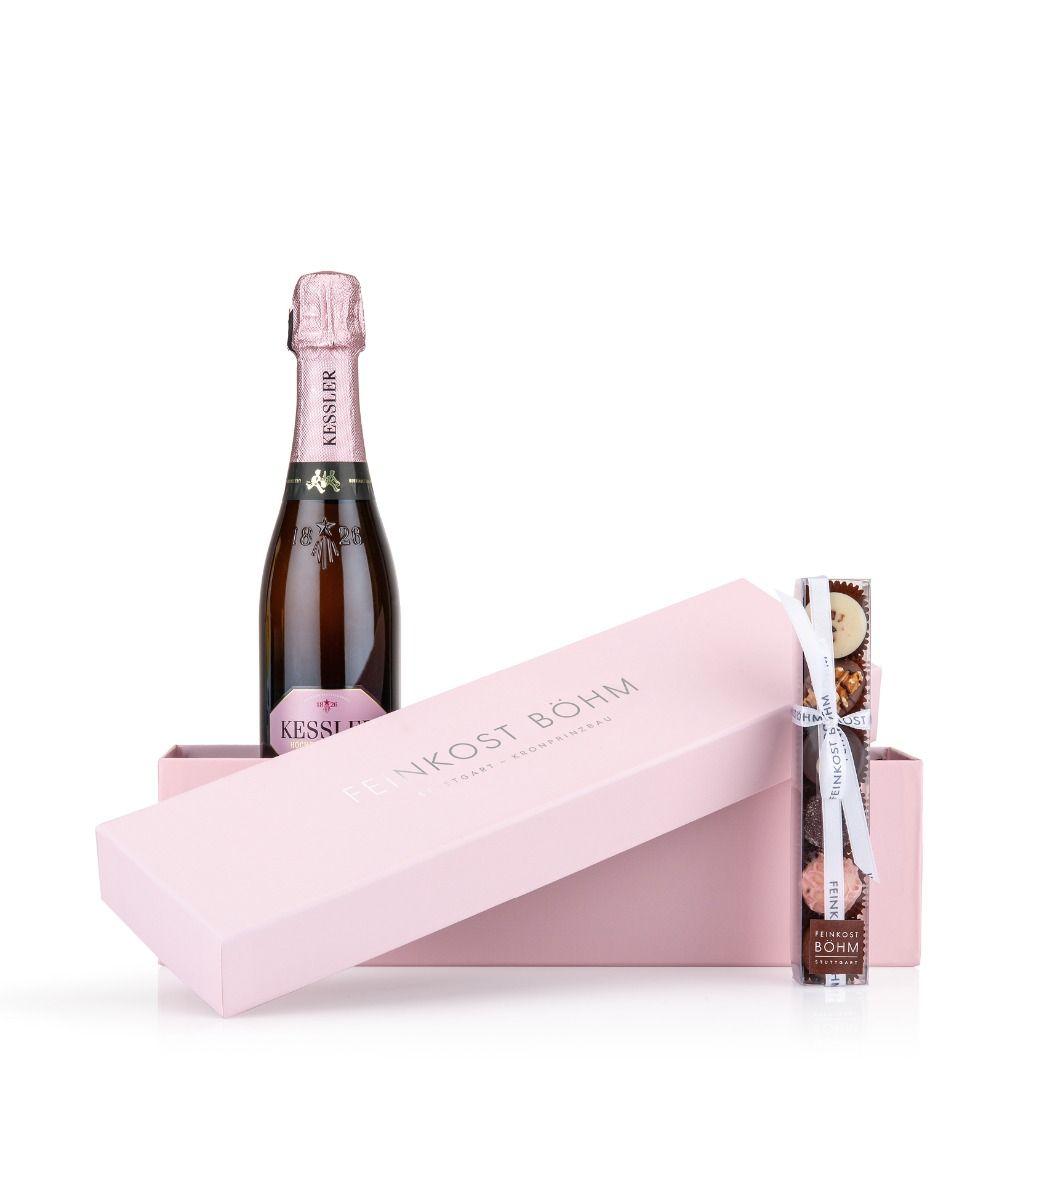 Box Rosé